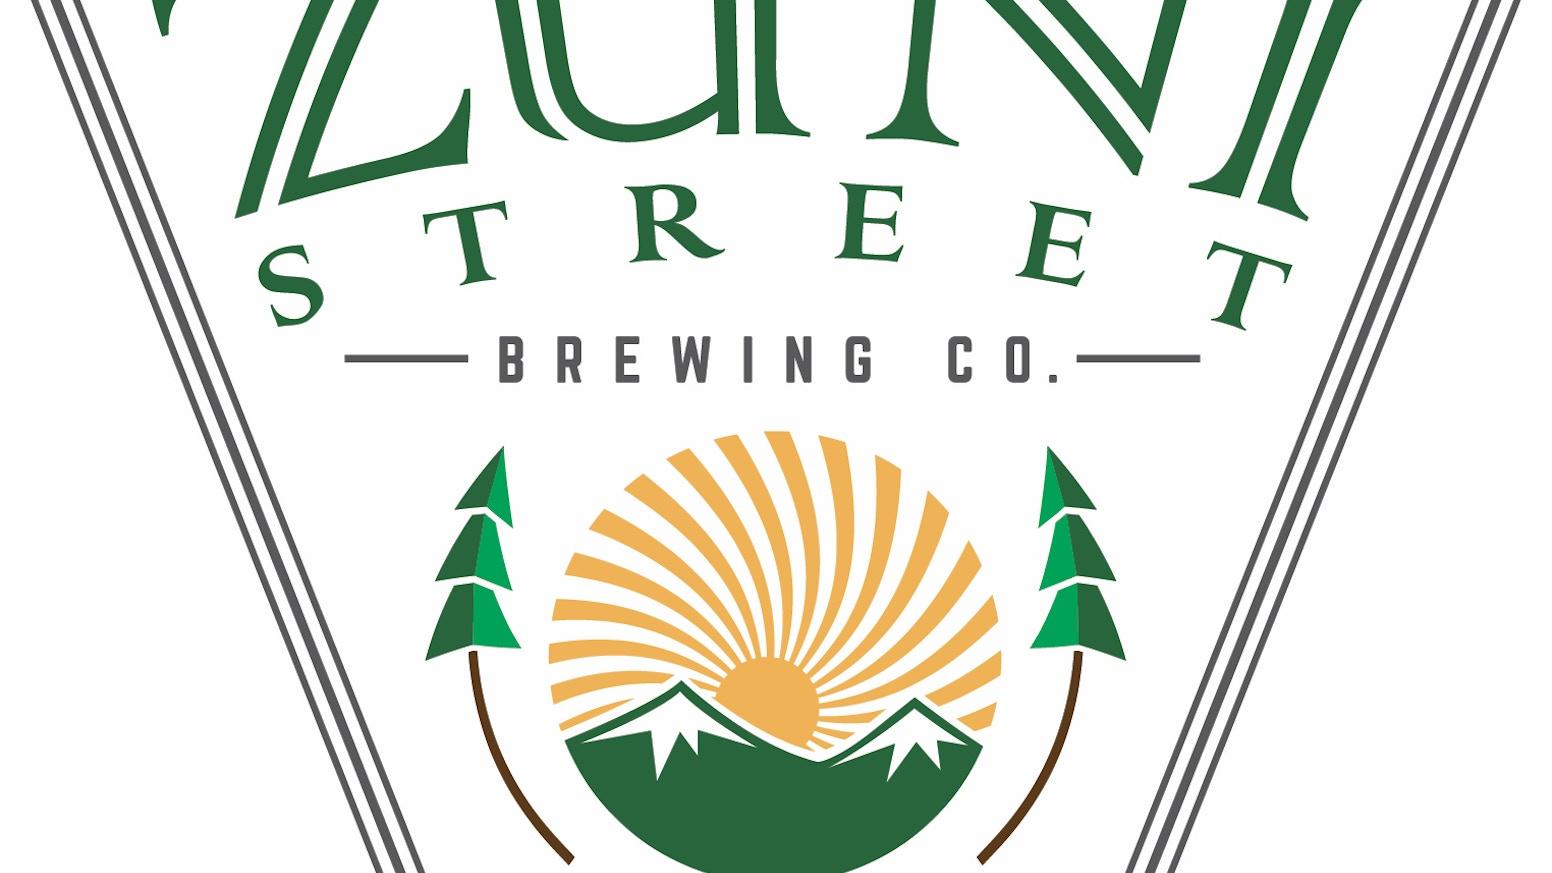 Zuni Street Brewing Company Kickstarter Campaign By Zuni Street